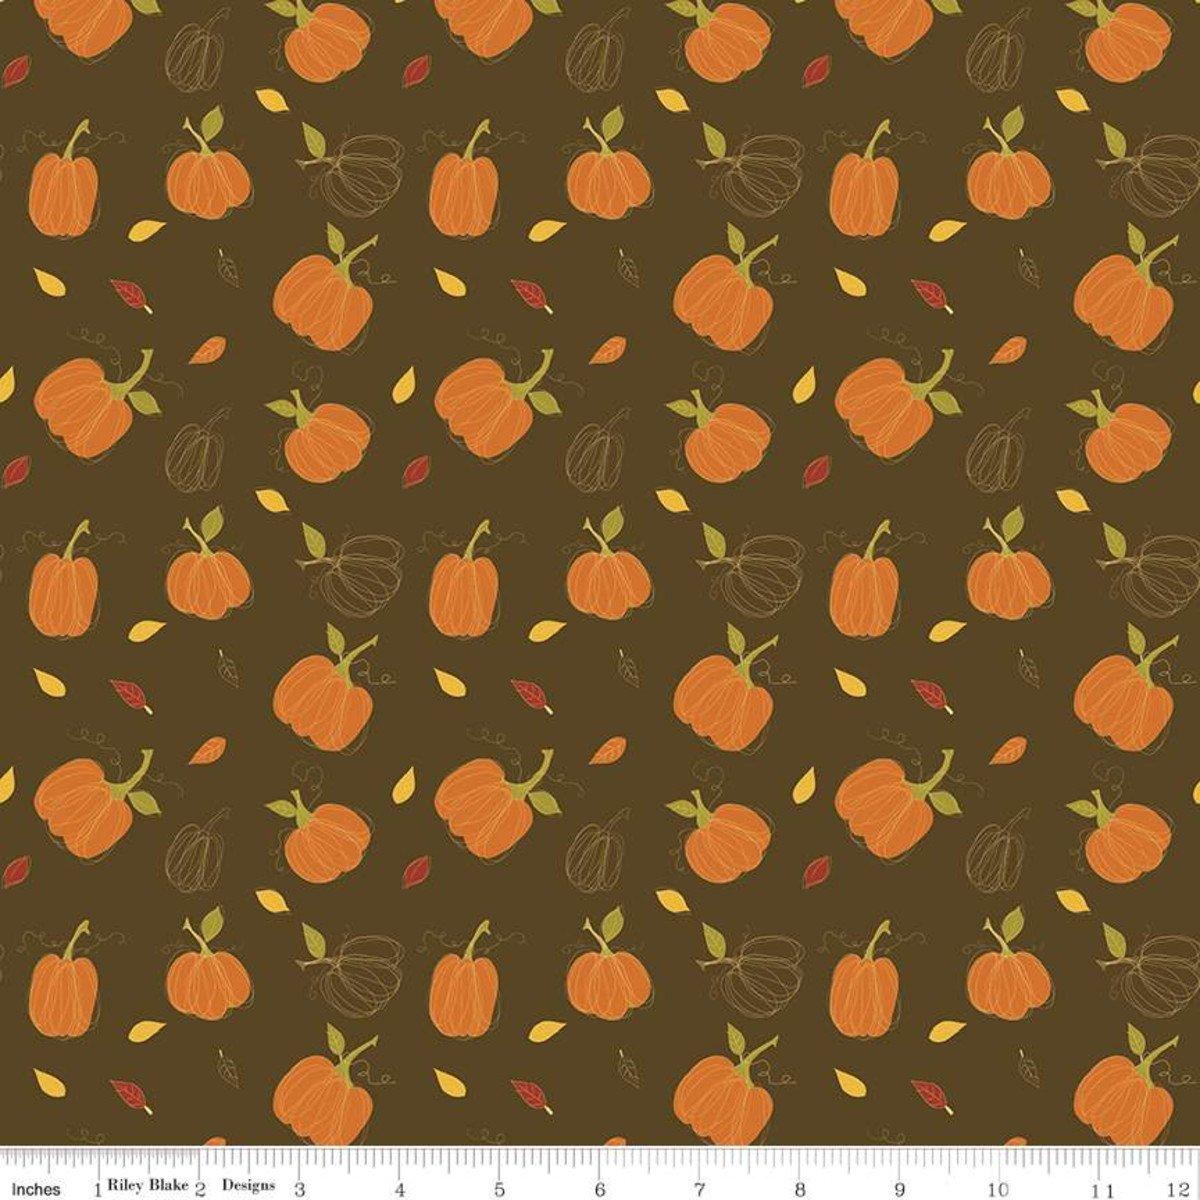 Adel in Autumn - Pumpkins - Chocolate